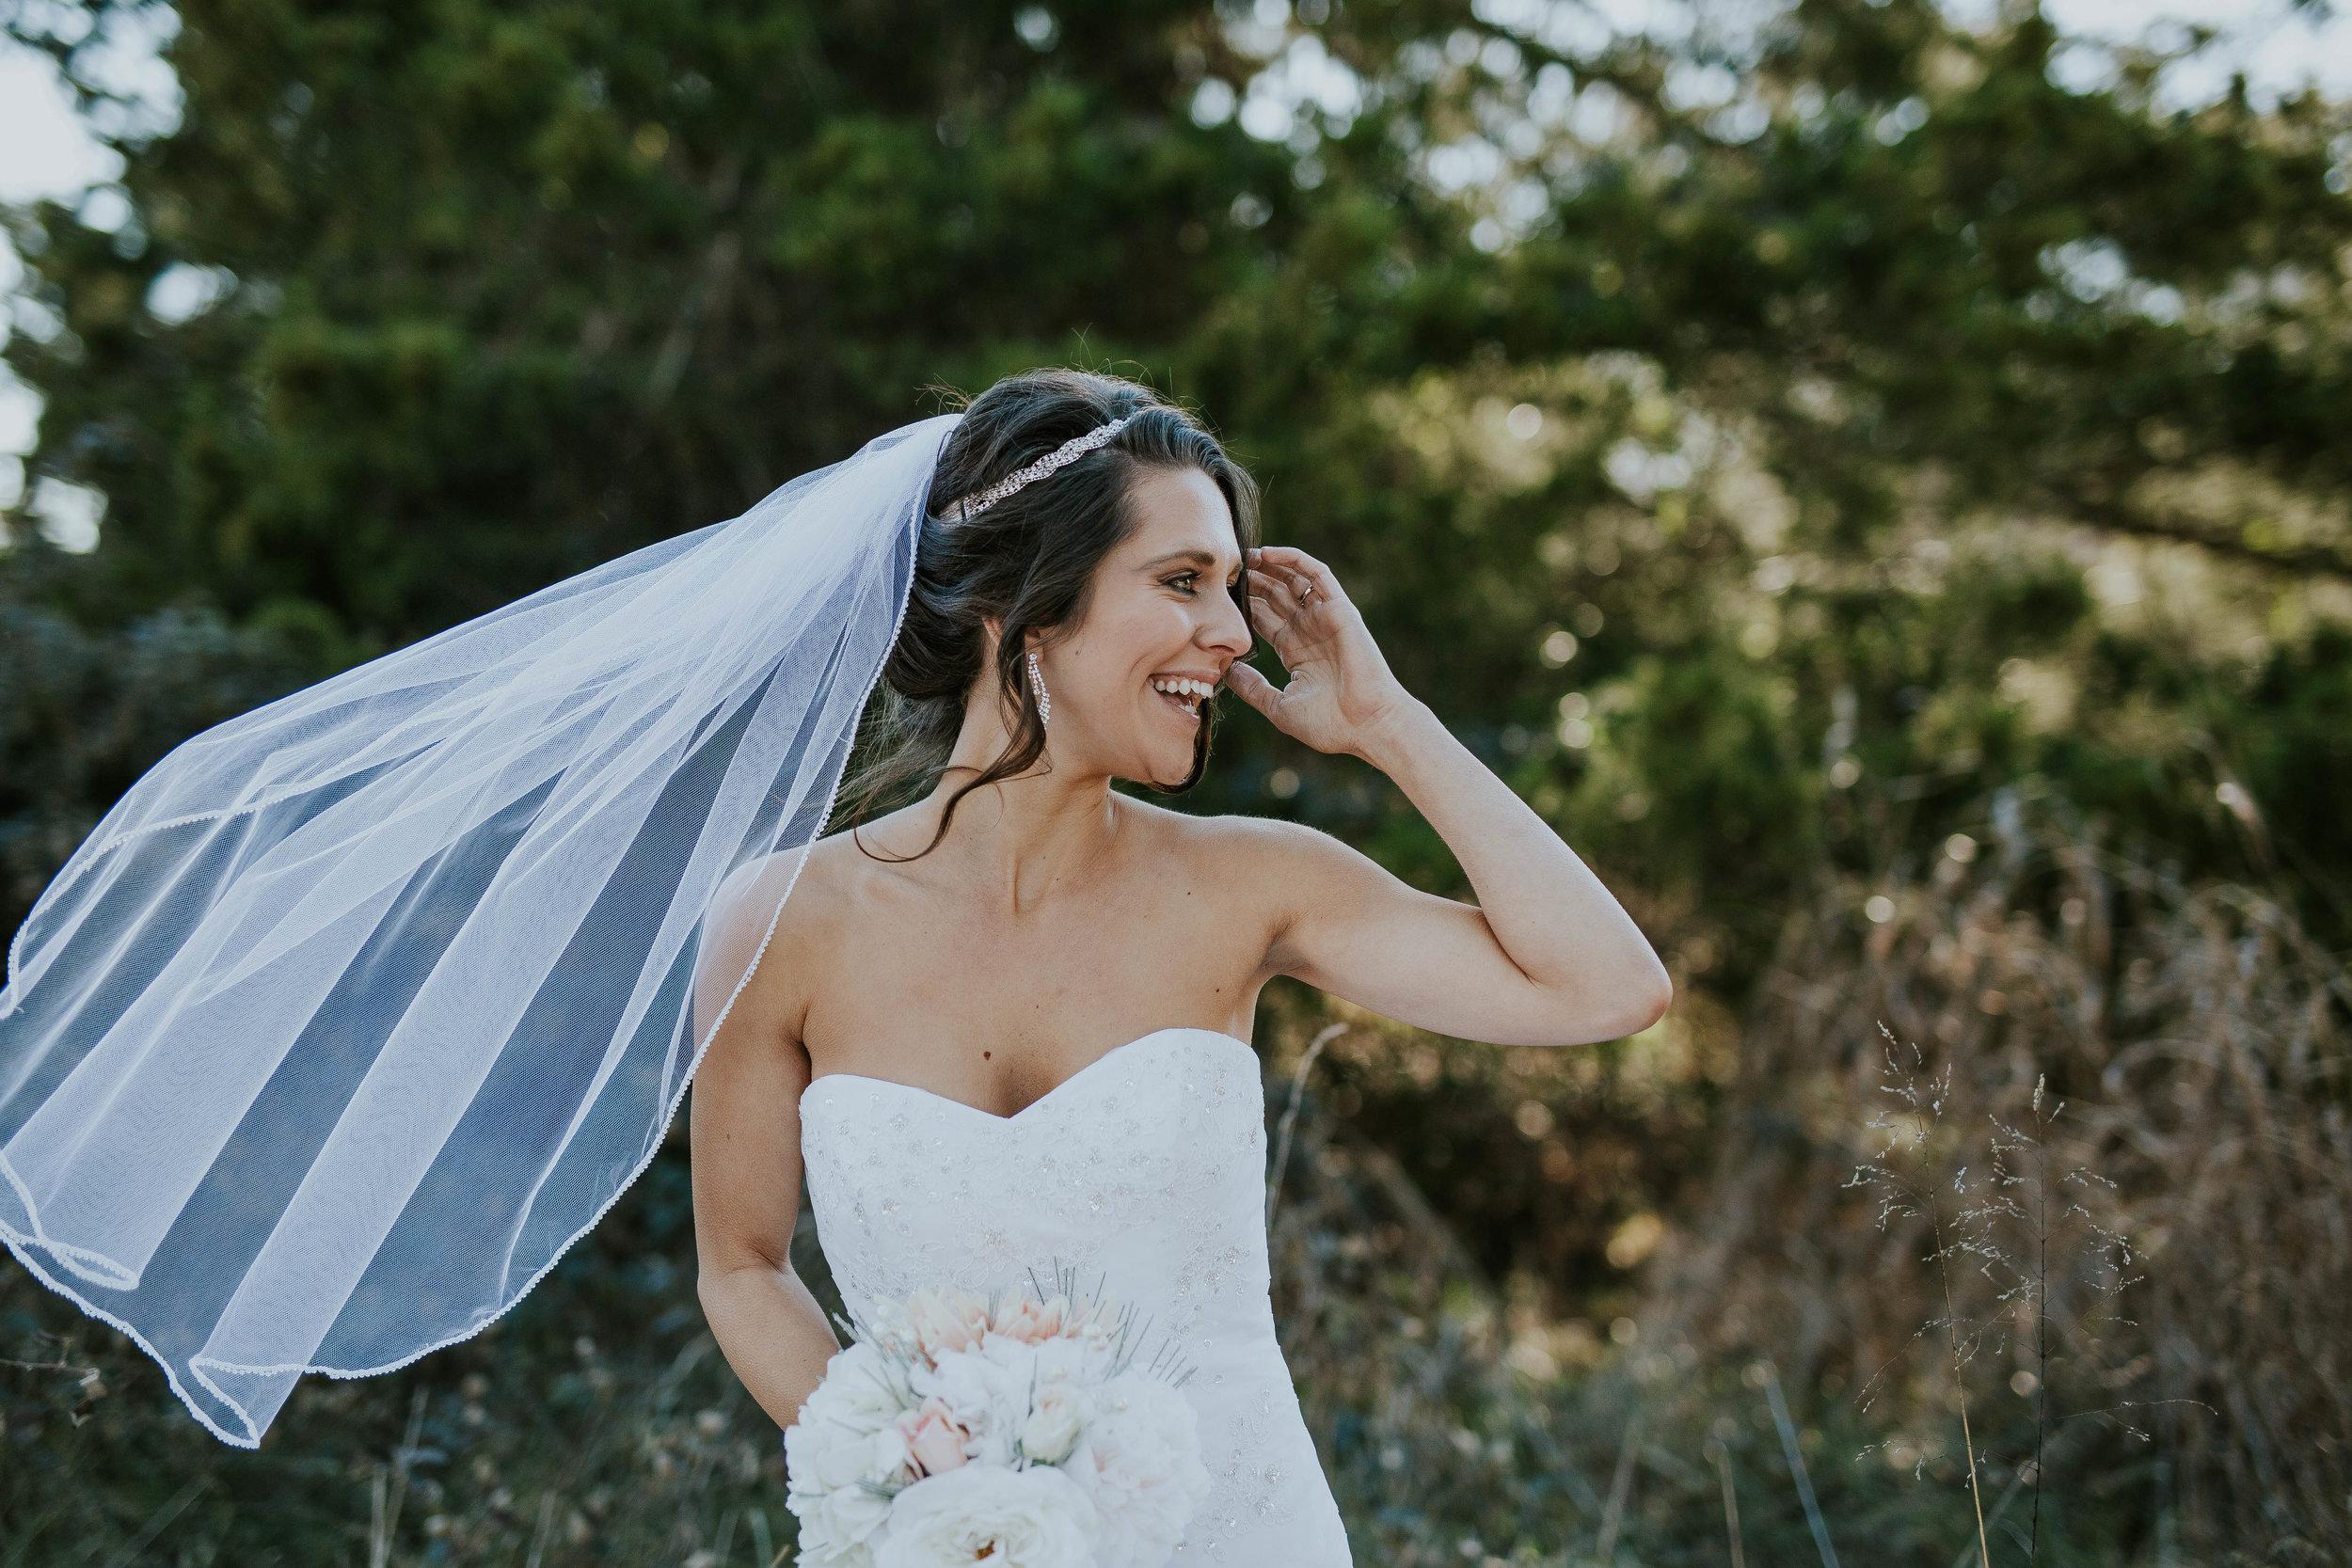 fdsfdsfdsfdsf - dfdsfdsfdsfThe Wedding TeamWedding Planner – We Tie The KnotsFlorist – Edge DesignLive Painter – IamNotMaggieGetting Ready – St. Regis AtlantaWedding Ceremony – Swan House